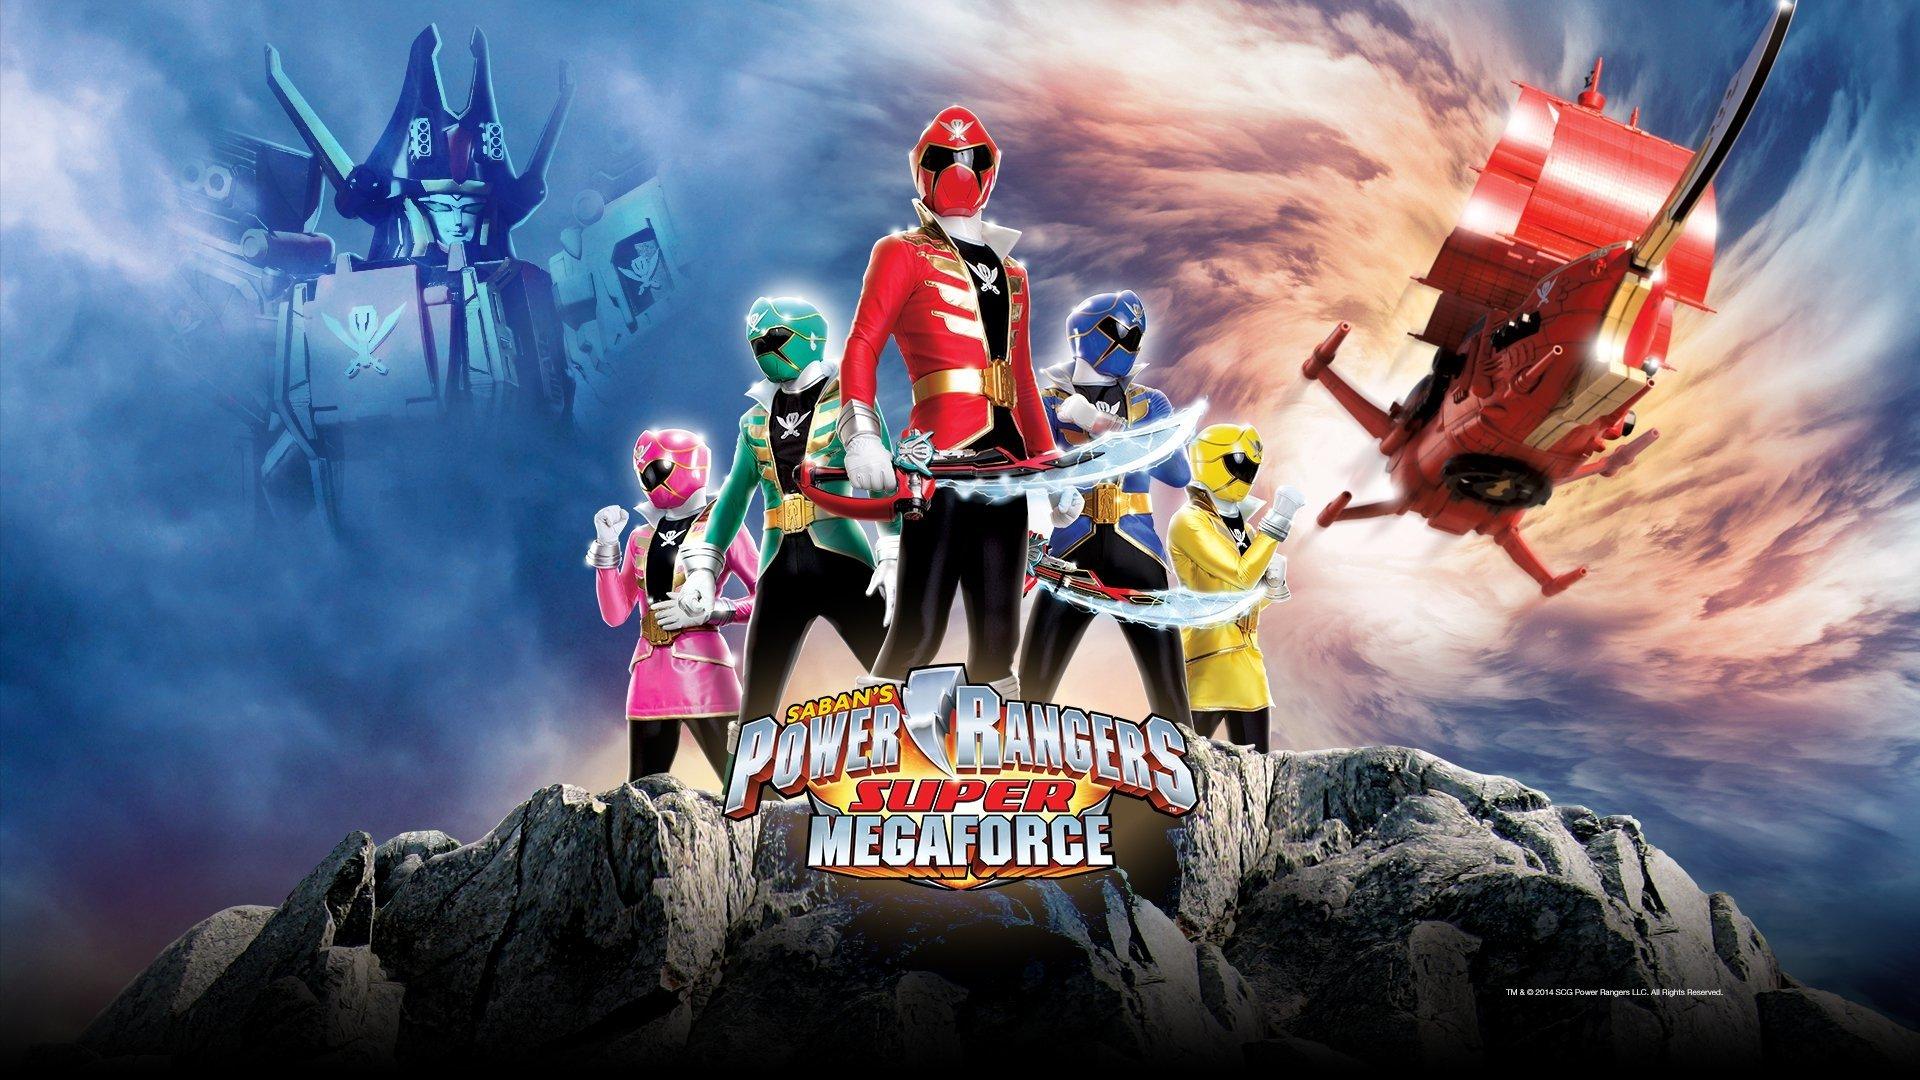 Power Rangers Super Megaforce 2